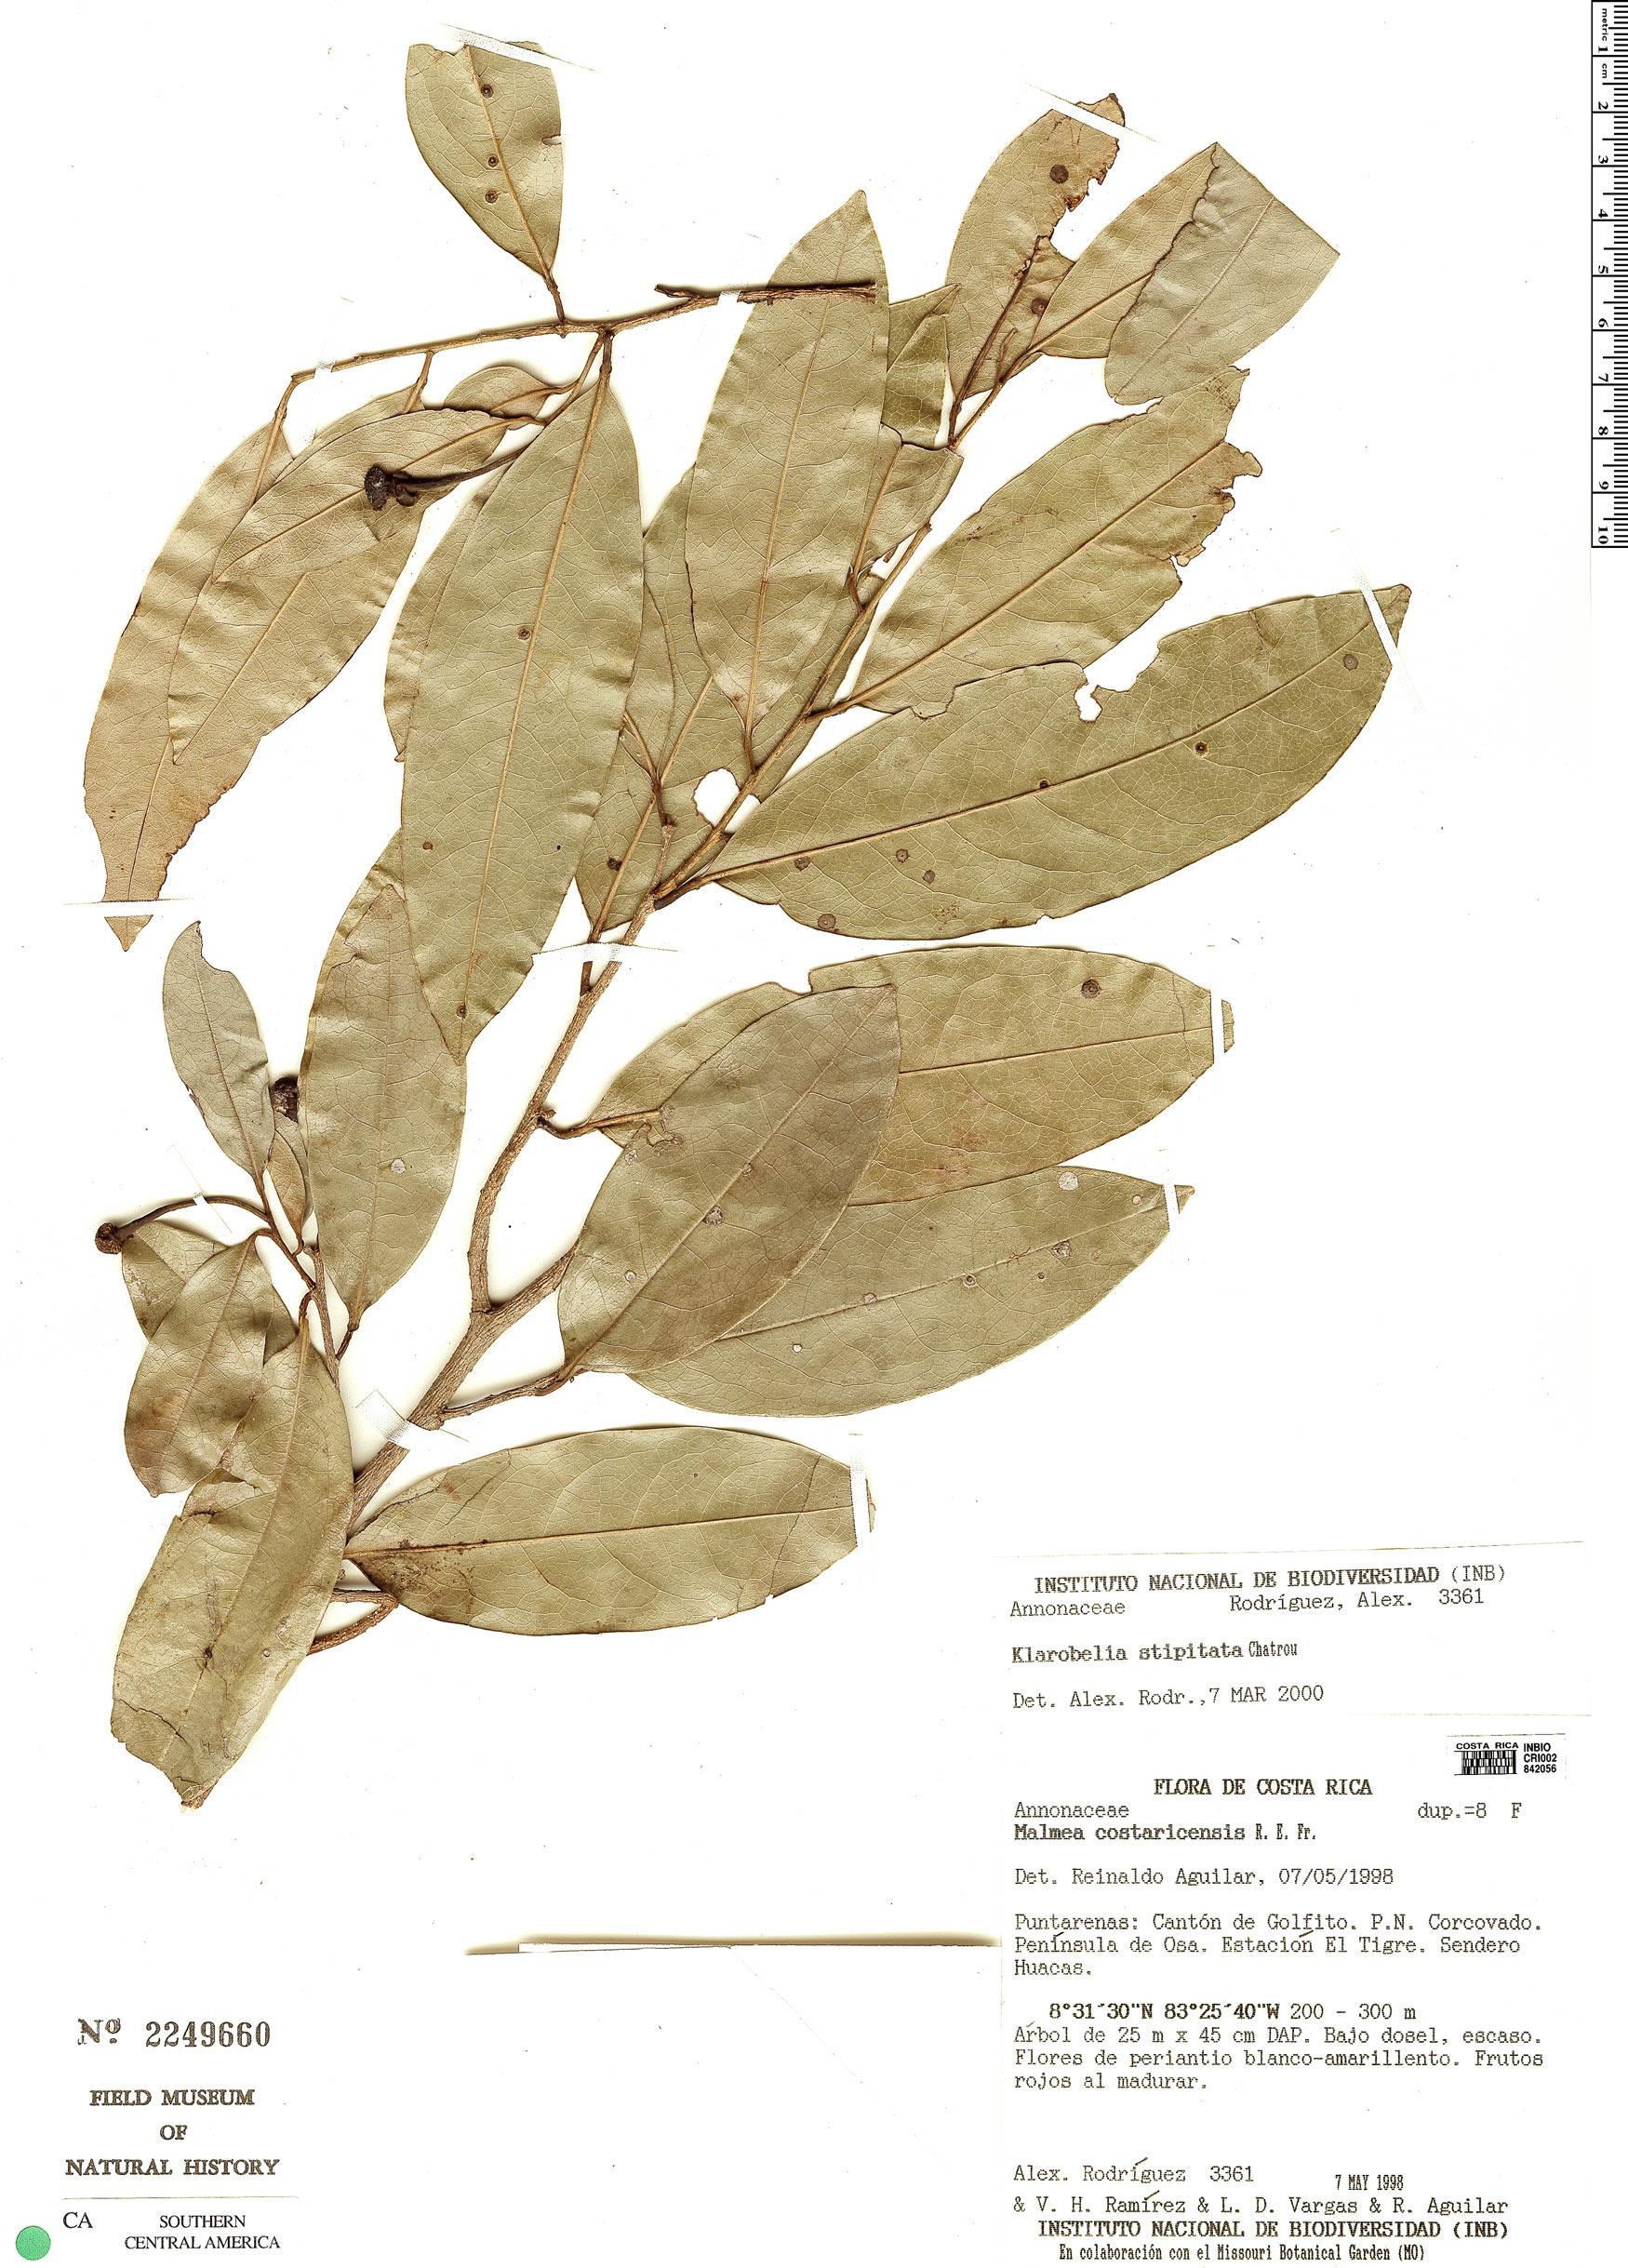 Specimen: Klarobelia stipitata